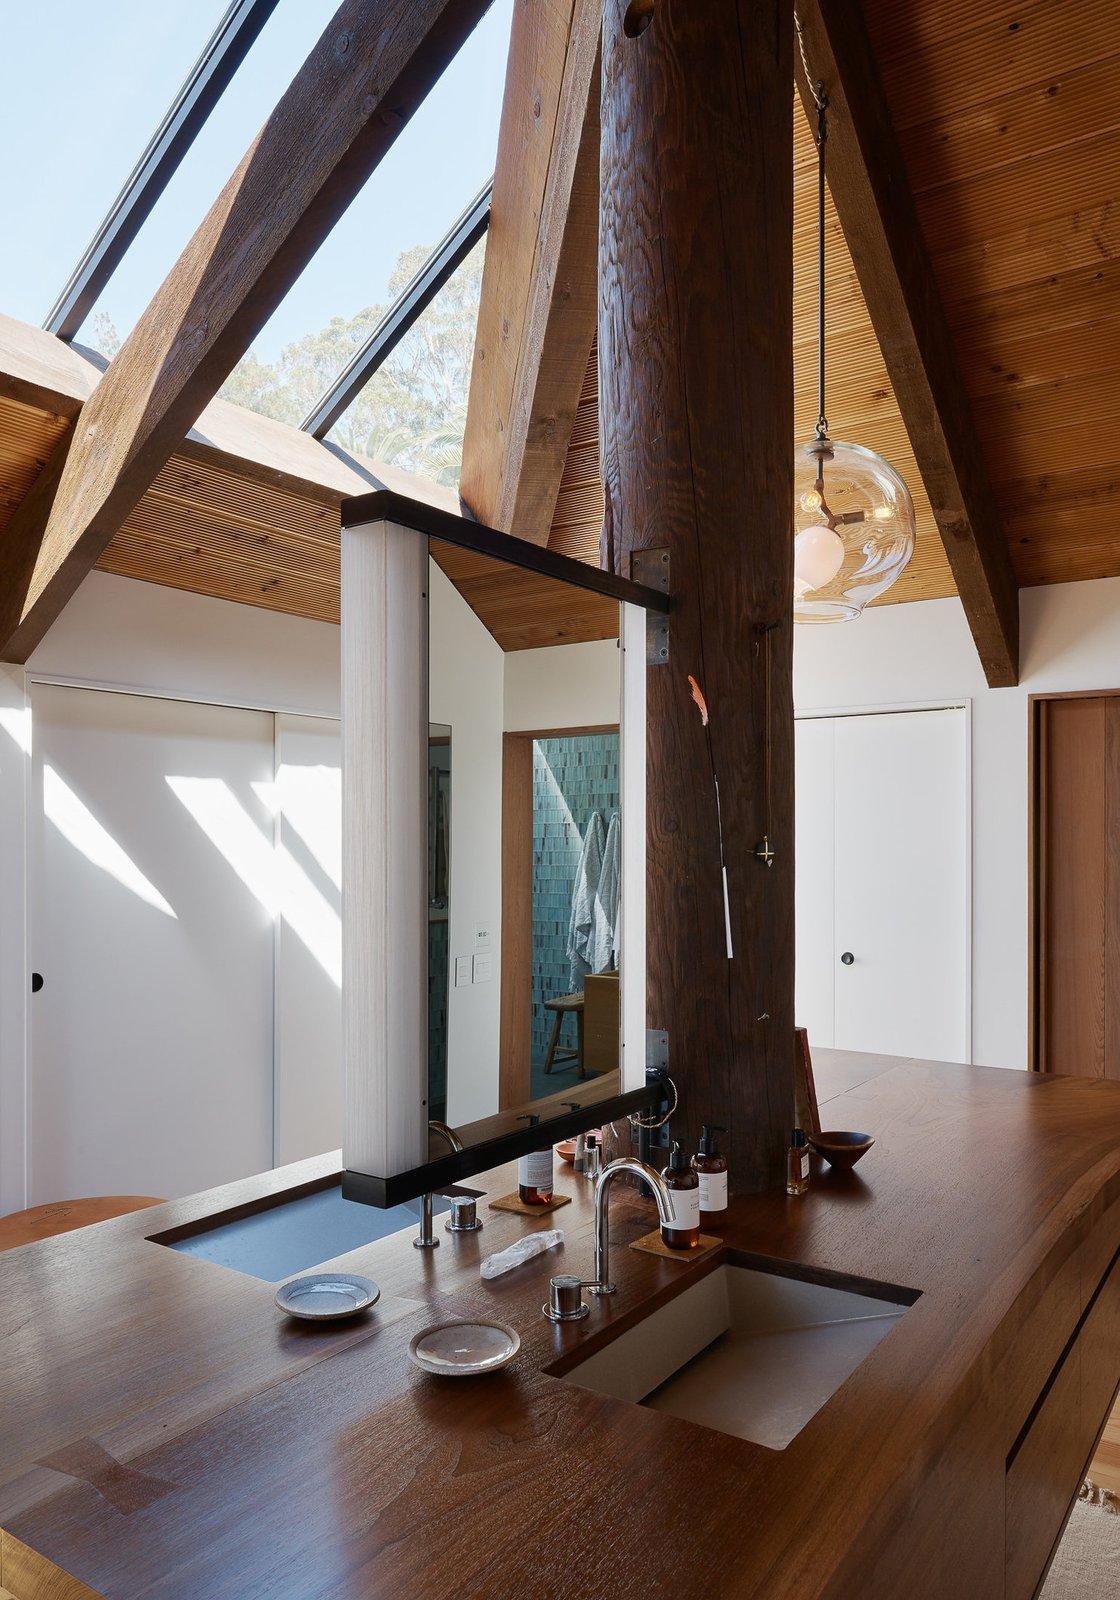 Bath Room, Light Hardwood Floor, Wood Counter, Drop In Sink, and Medium Hardwood Floor  Haiku House by SHED Architecture & Design